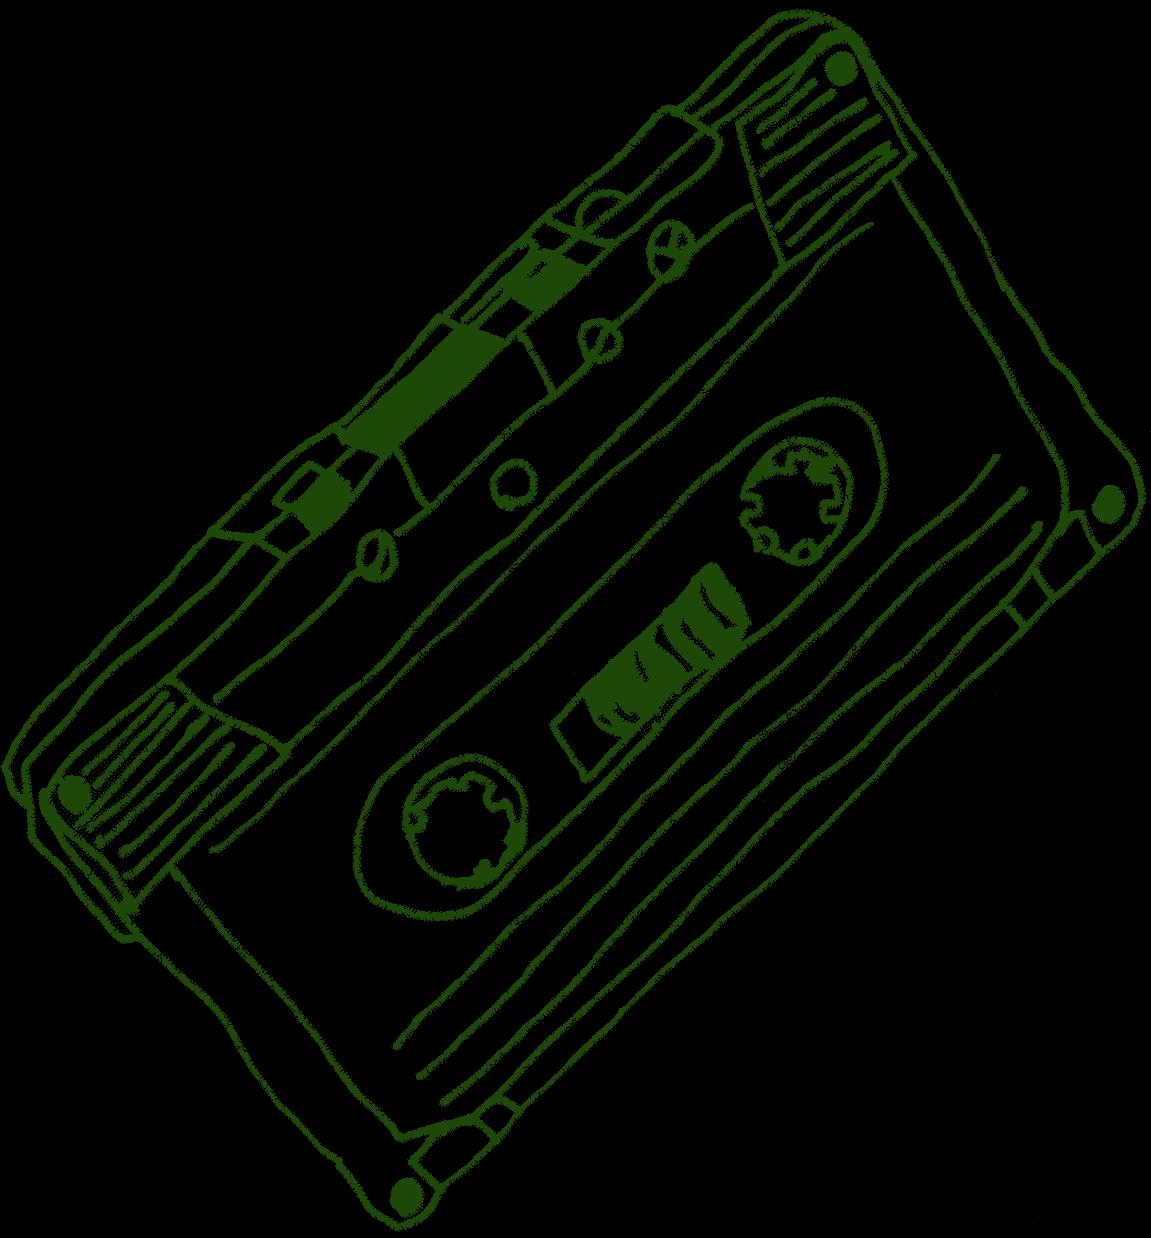 cassette-tape.png